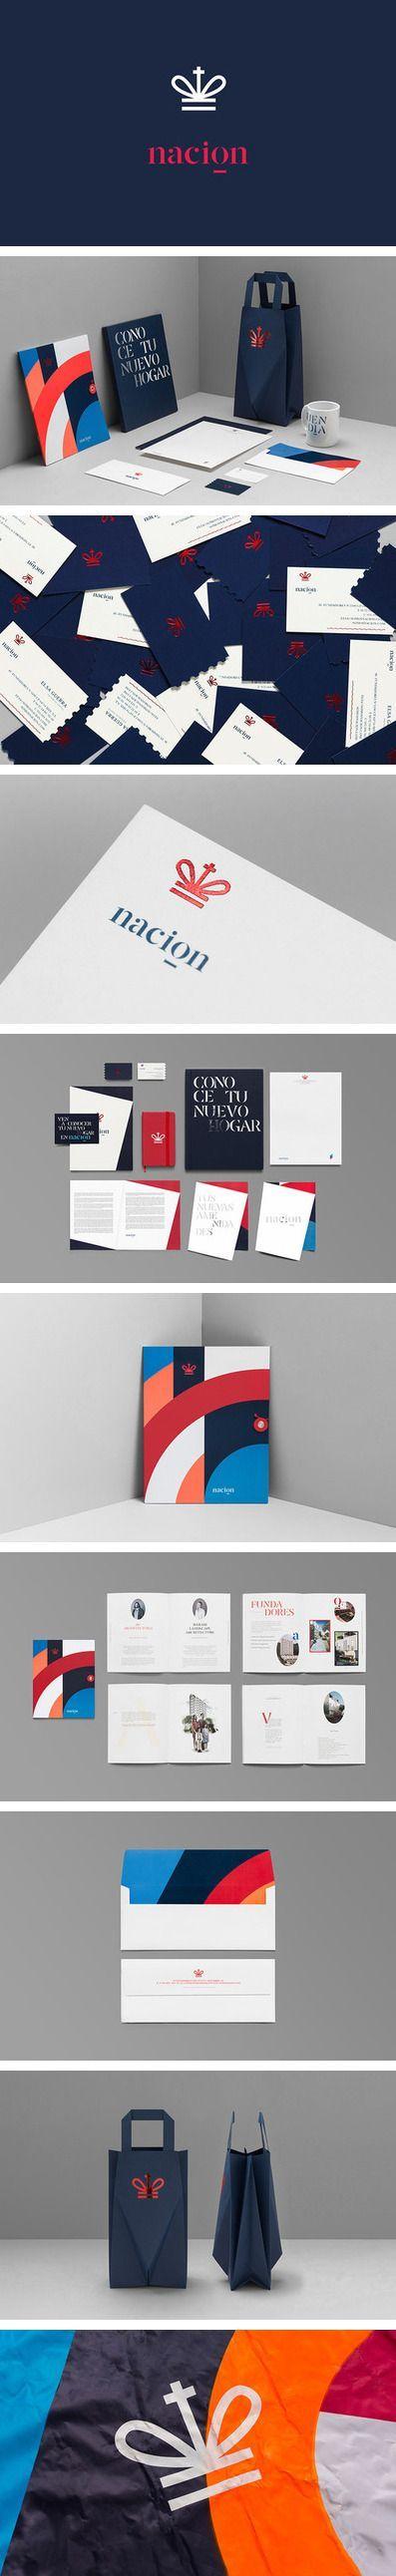 Nacion Real estate branding | Branding | Pinterest